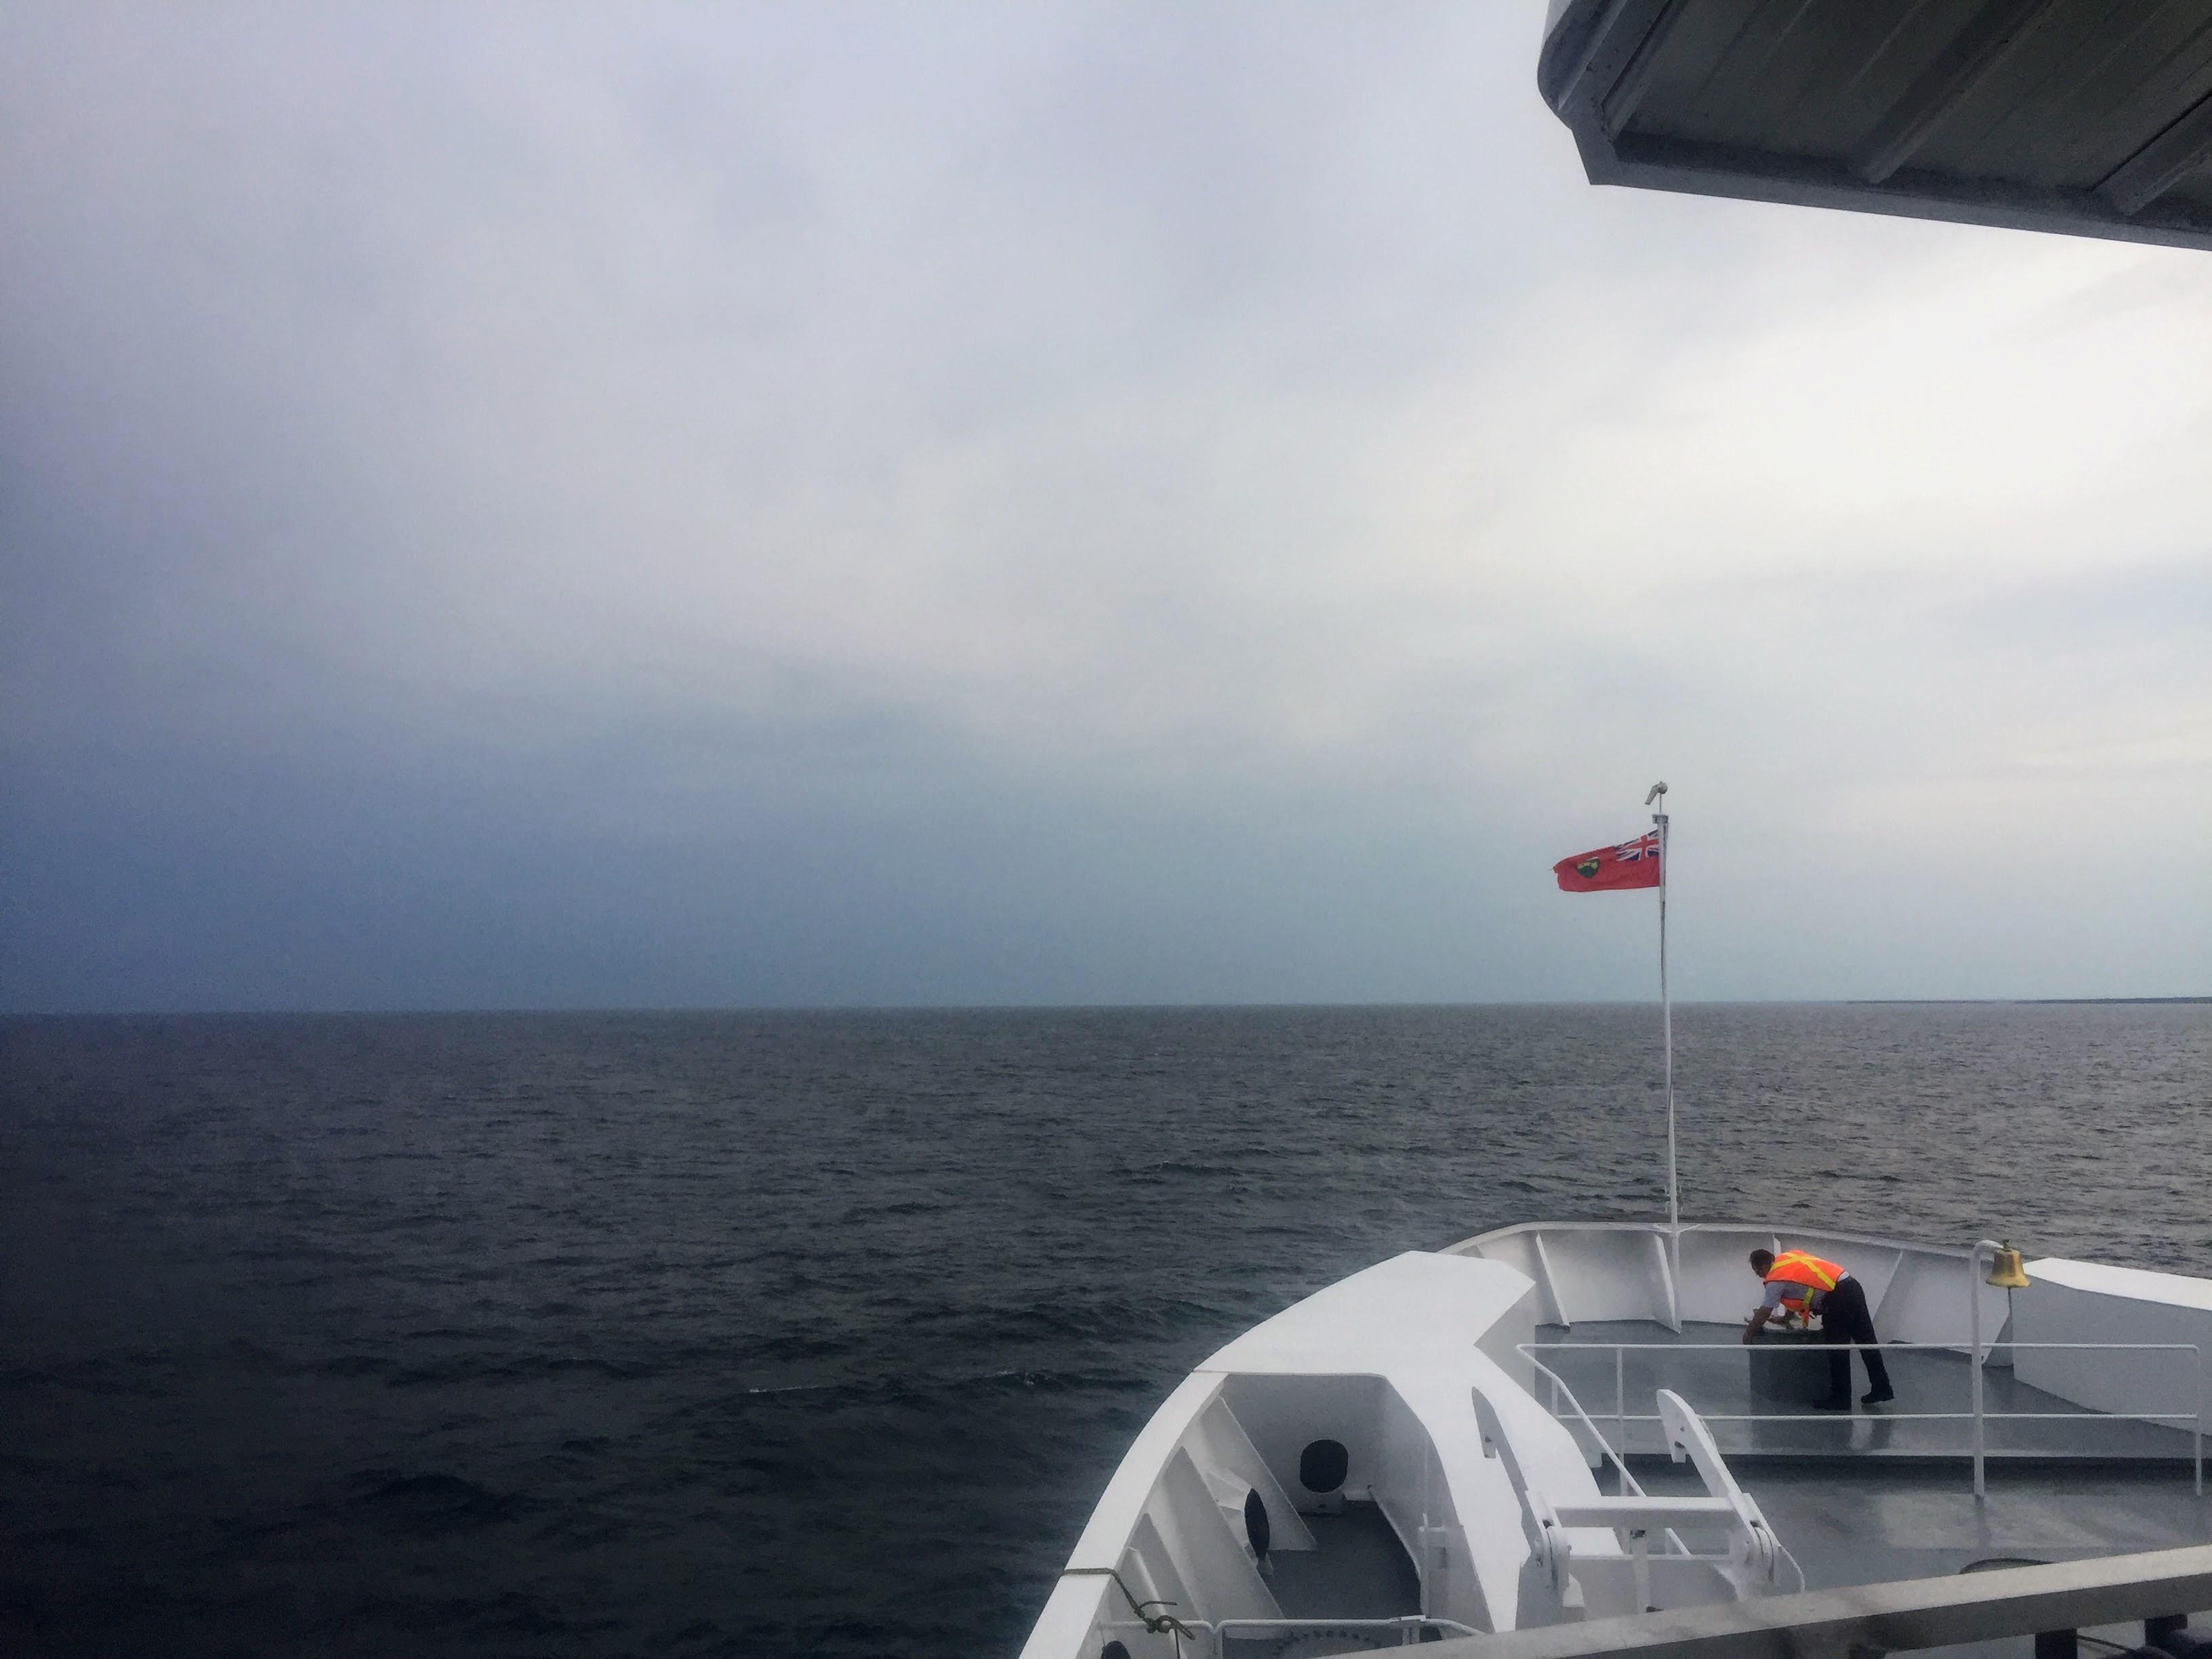 2017-08-28 Tobermory 6 Ferry